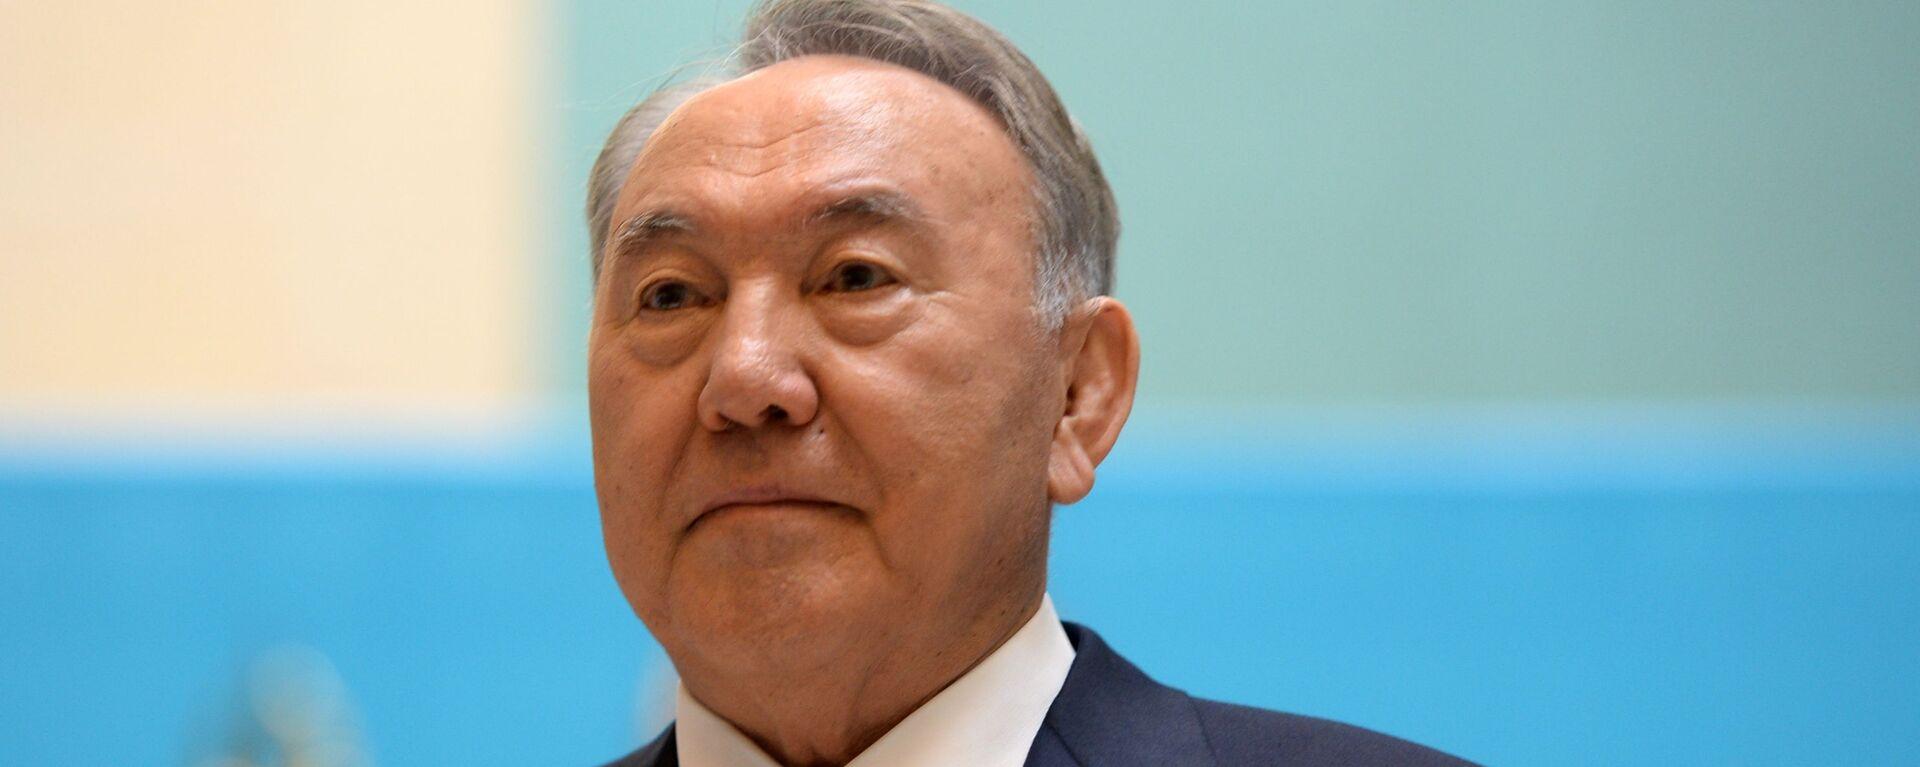 Президент Казахстана Нурсултан Назарбаев - Sputnik Латвия, 1920, 20.03.2019